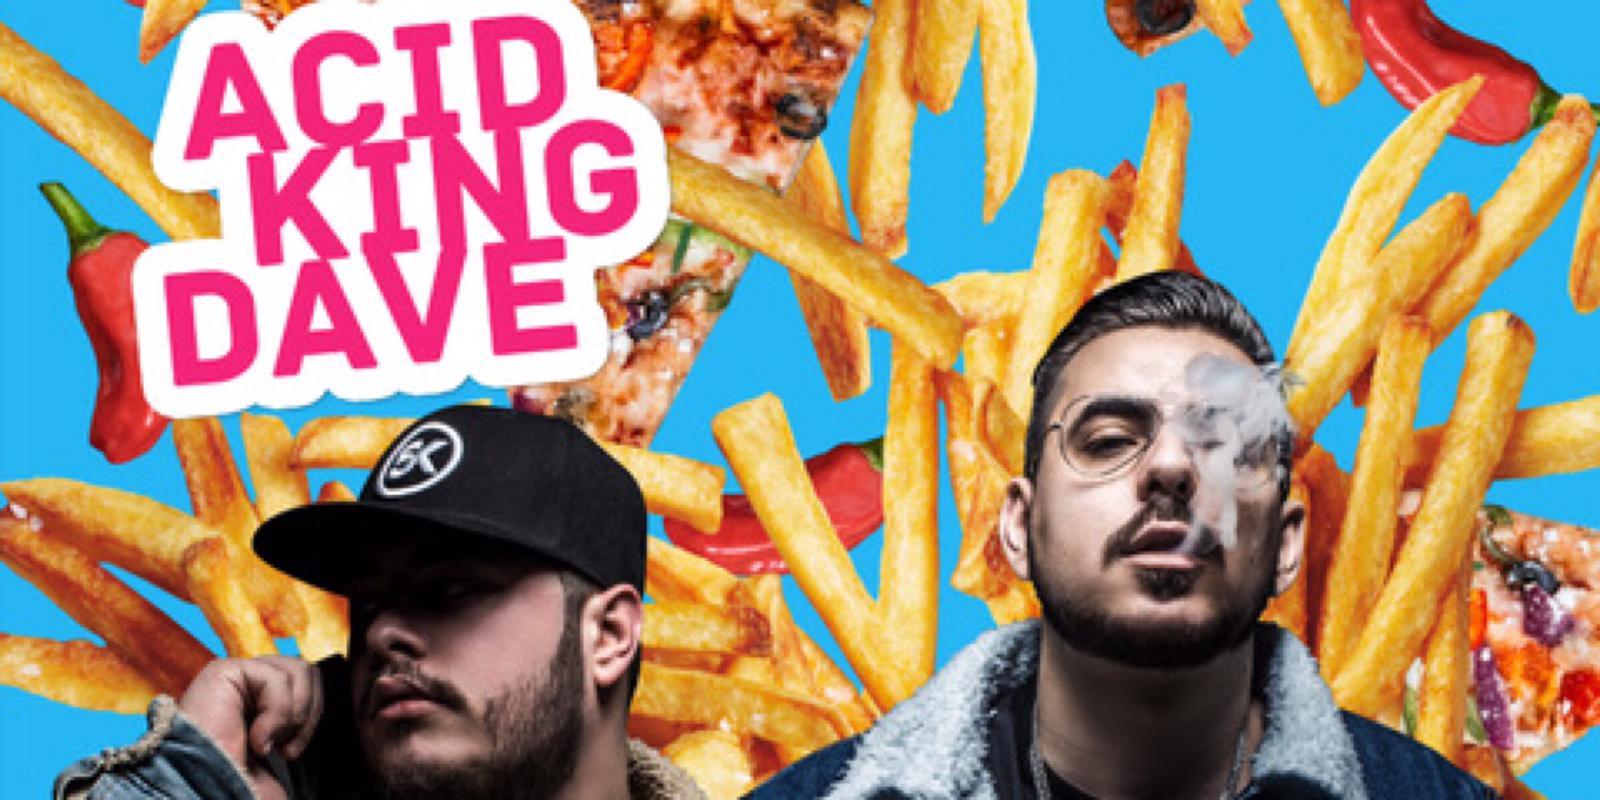 Album: Lirik & Les – «Acid King Dave»